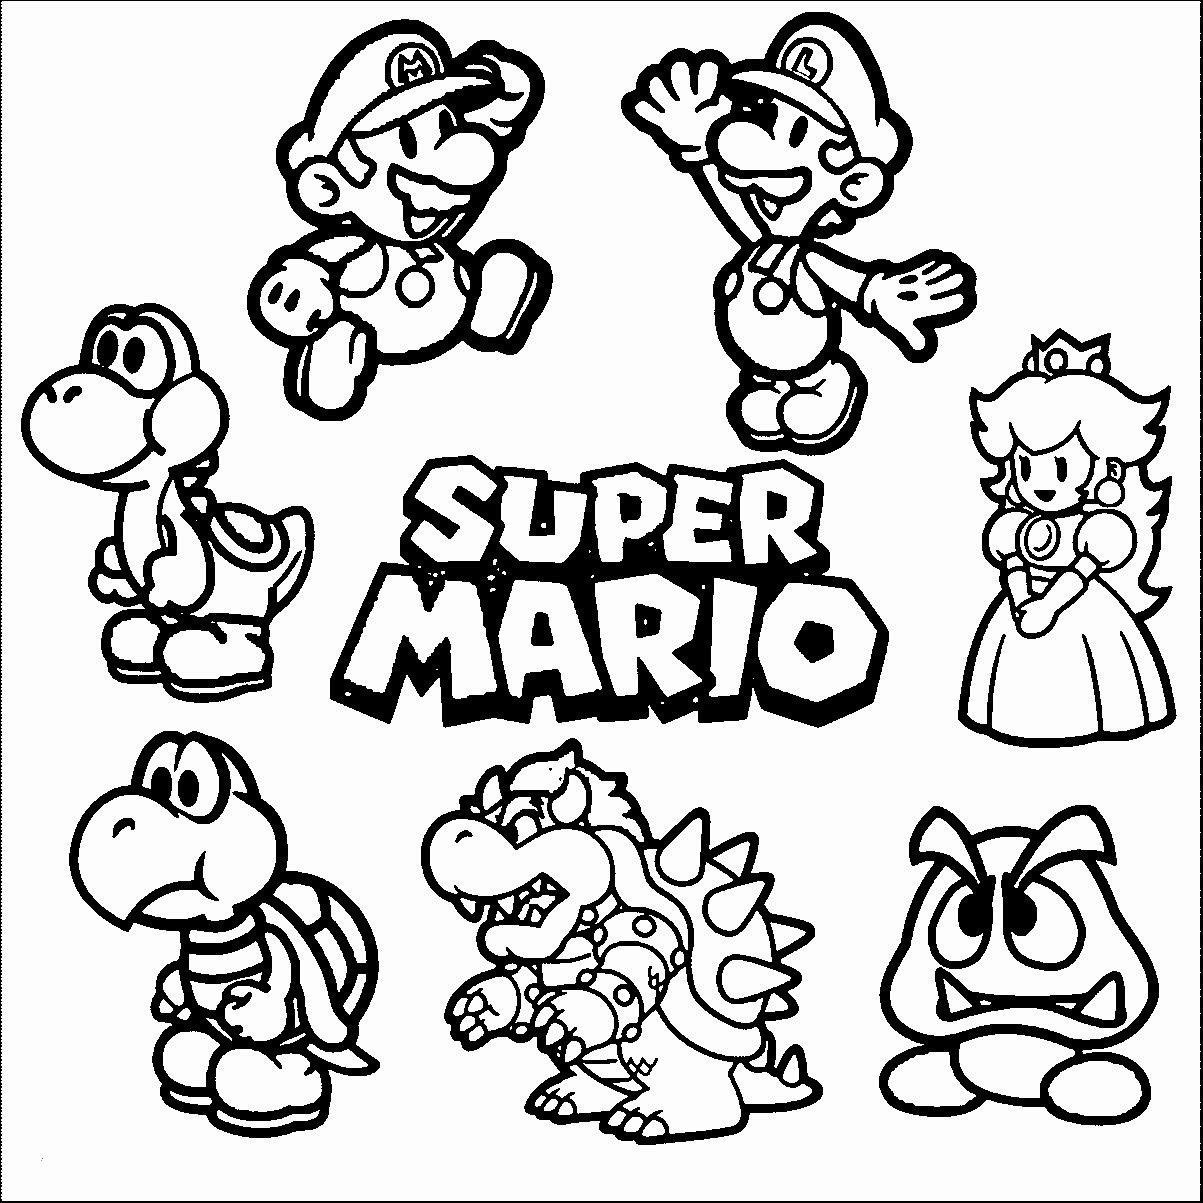 Mario Kart Ausmalbild Genial 40 Bvb Ausmalbilder Scoredatscore Inspirierend Mario Kart Galerie